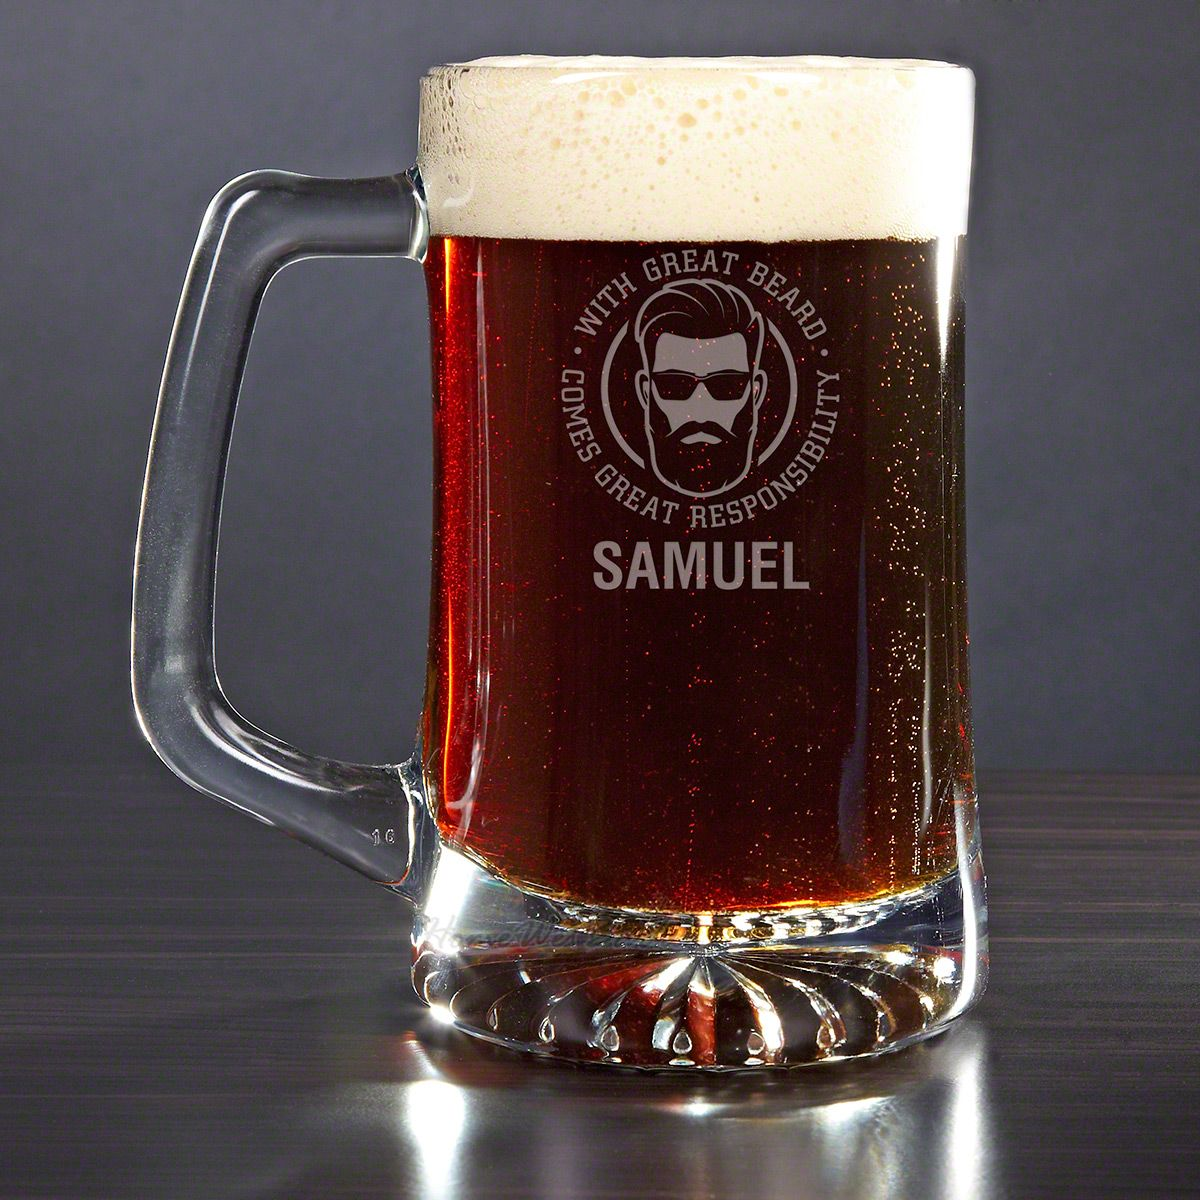 Great Beard, Great Responsibility Beer Mug - Funny Beard Gift